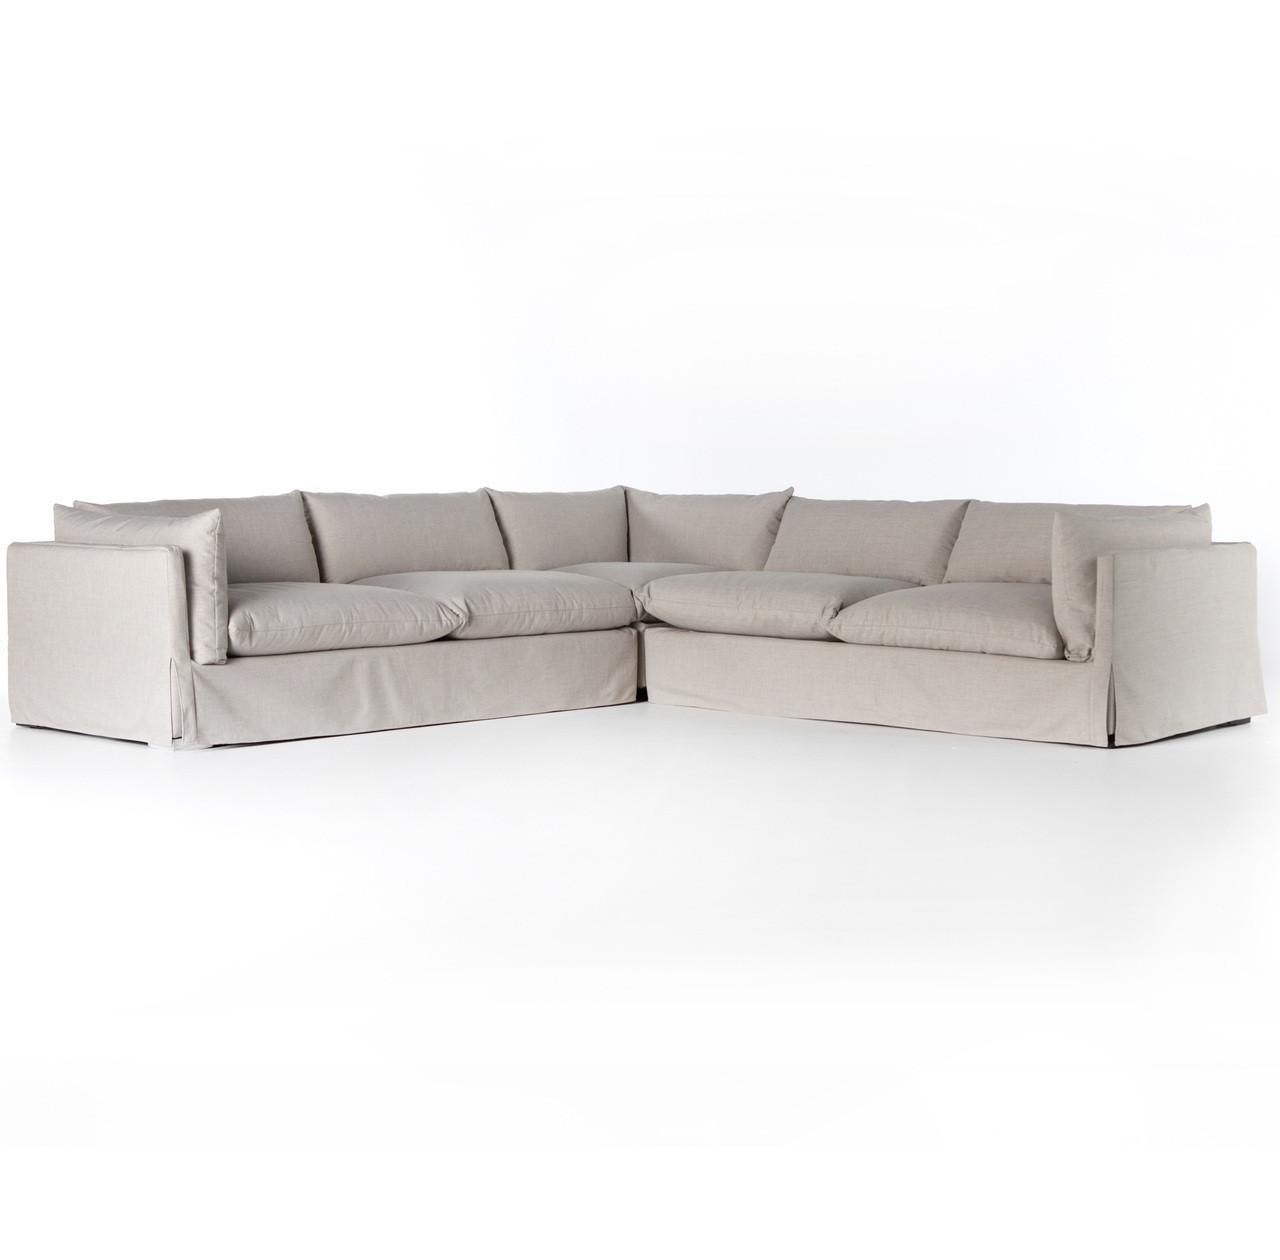 Grant Modern Charcoal Grey Armless Corner Sectional: Loft Modern Beige Slipcovered Corner Sectional